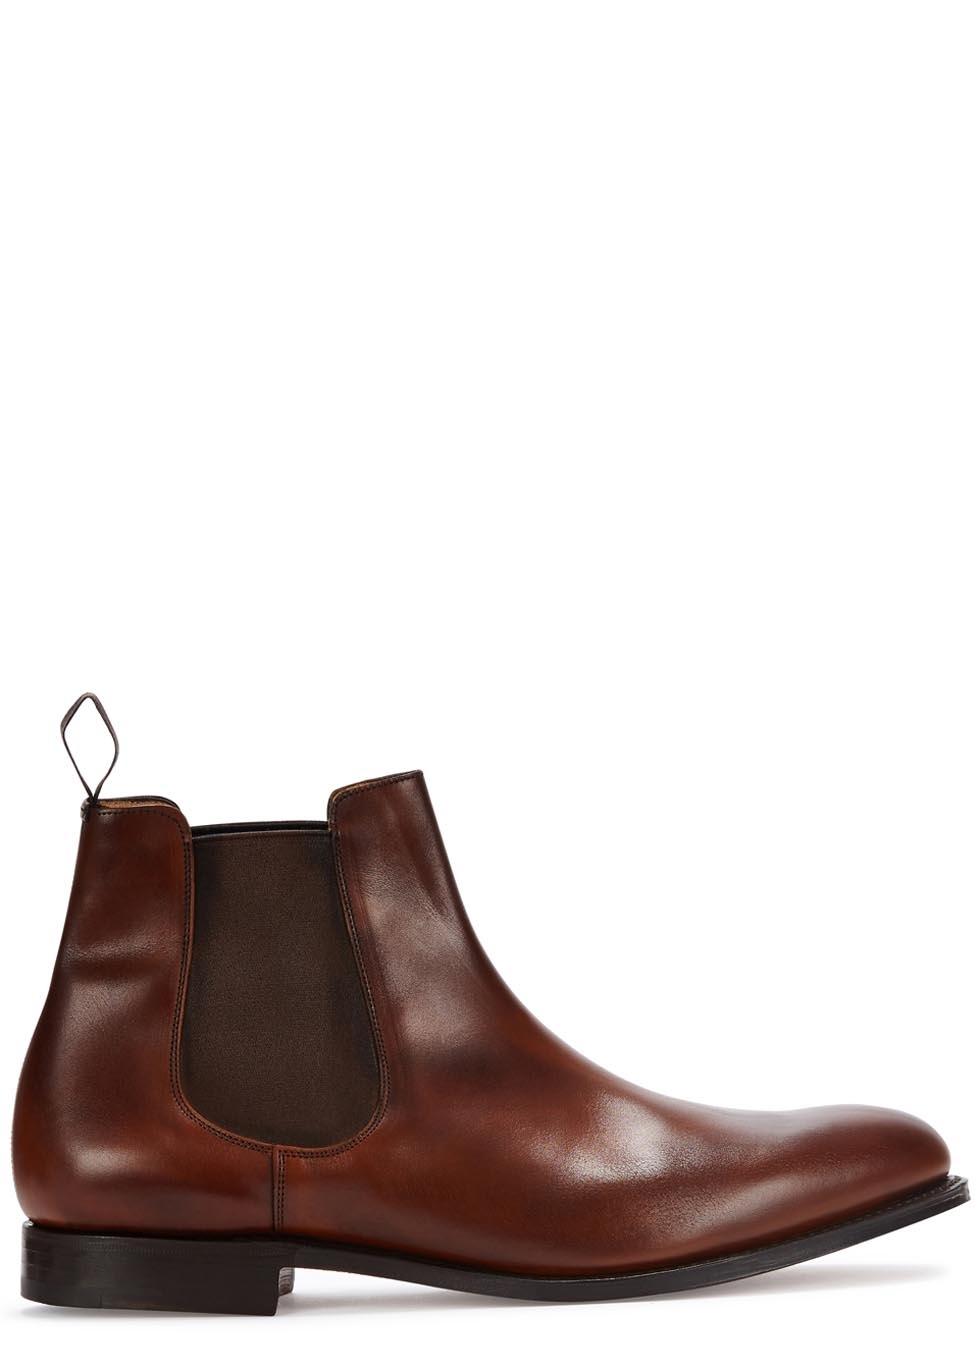 Church S Shoes Knightsbridge